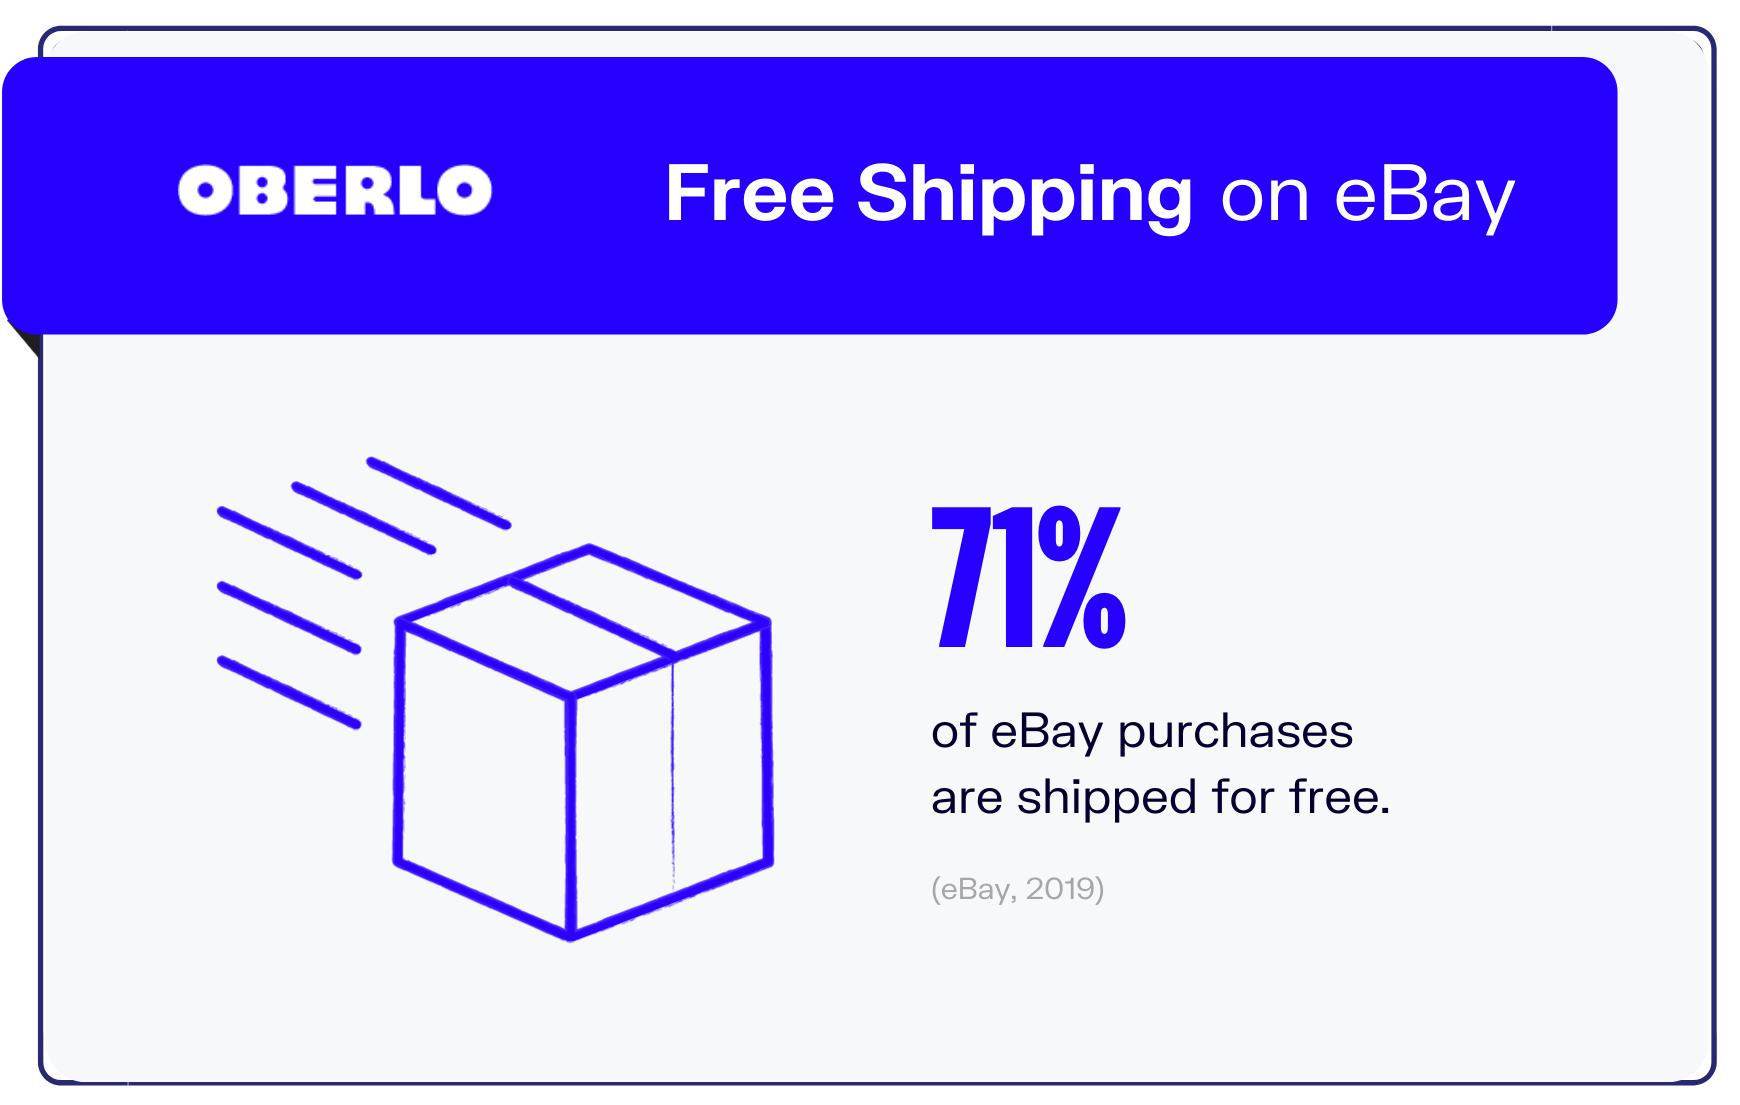 ebay statistics graphic 8